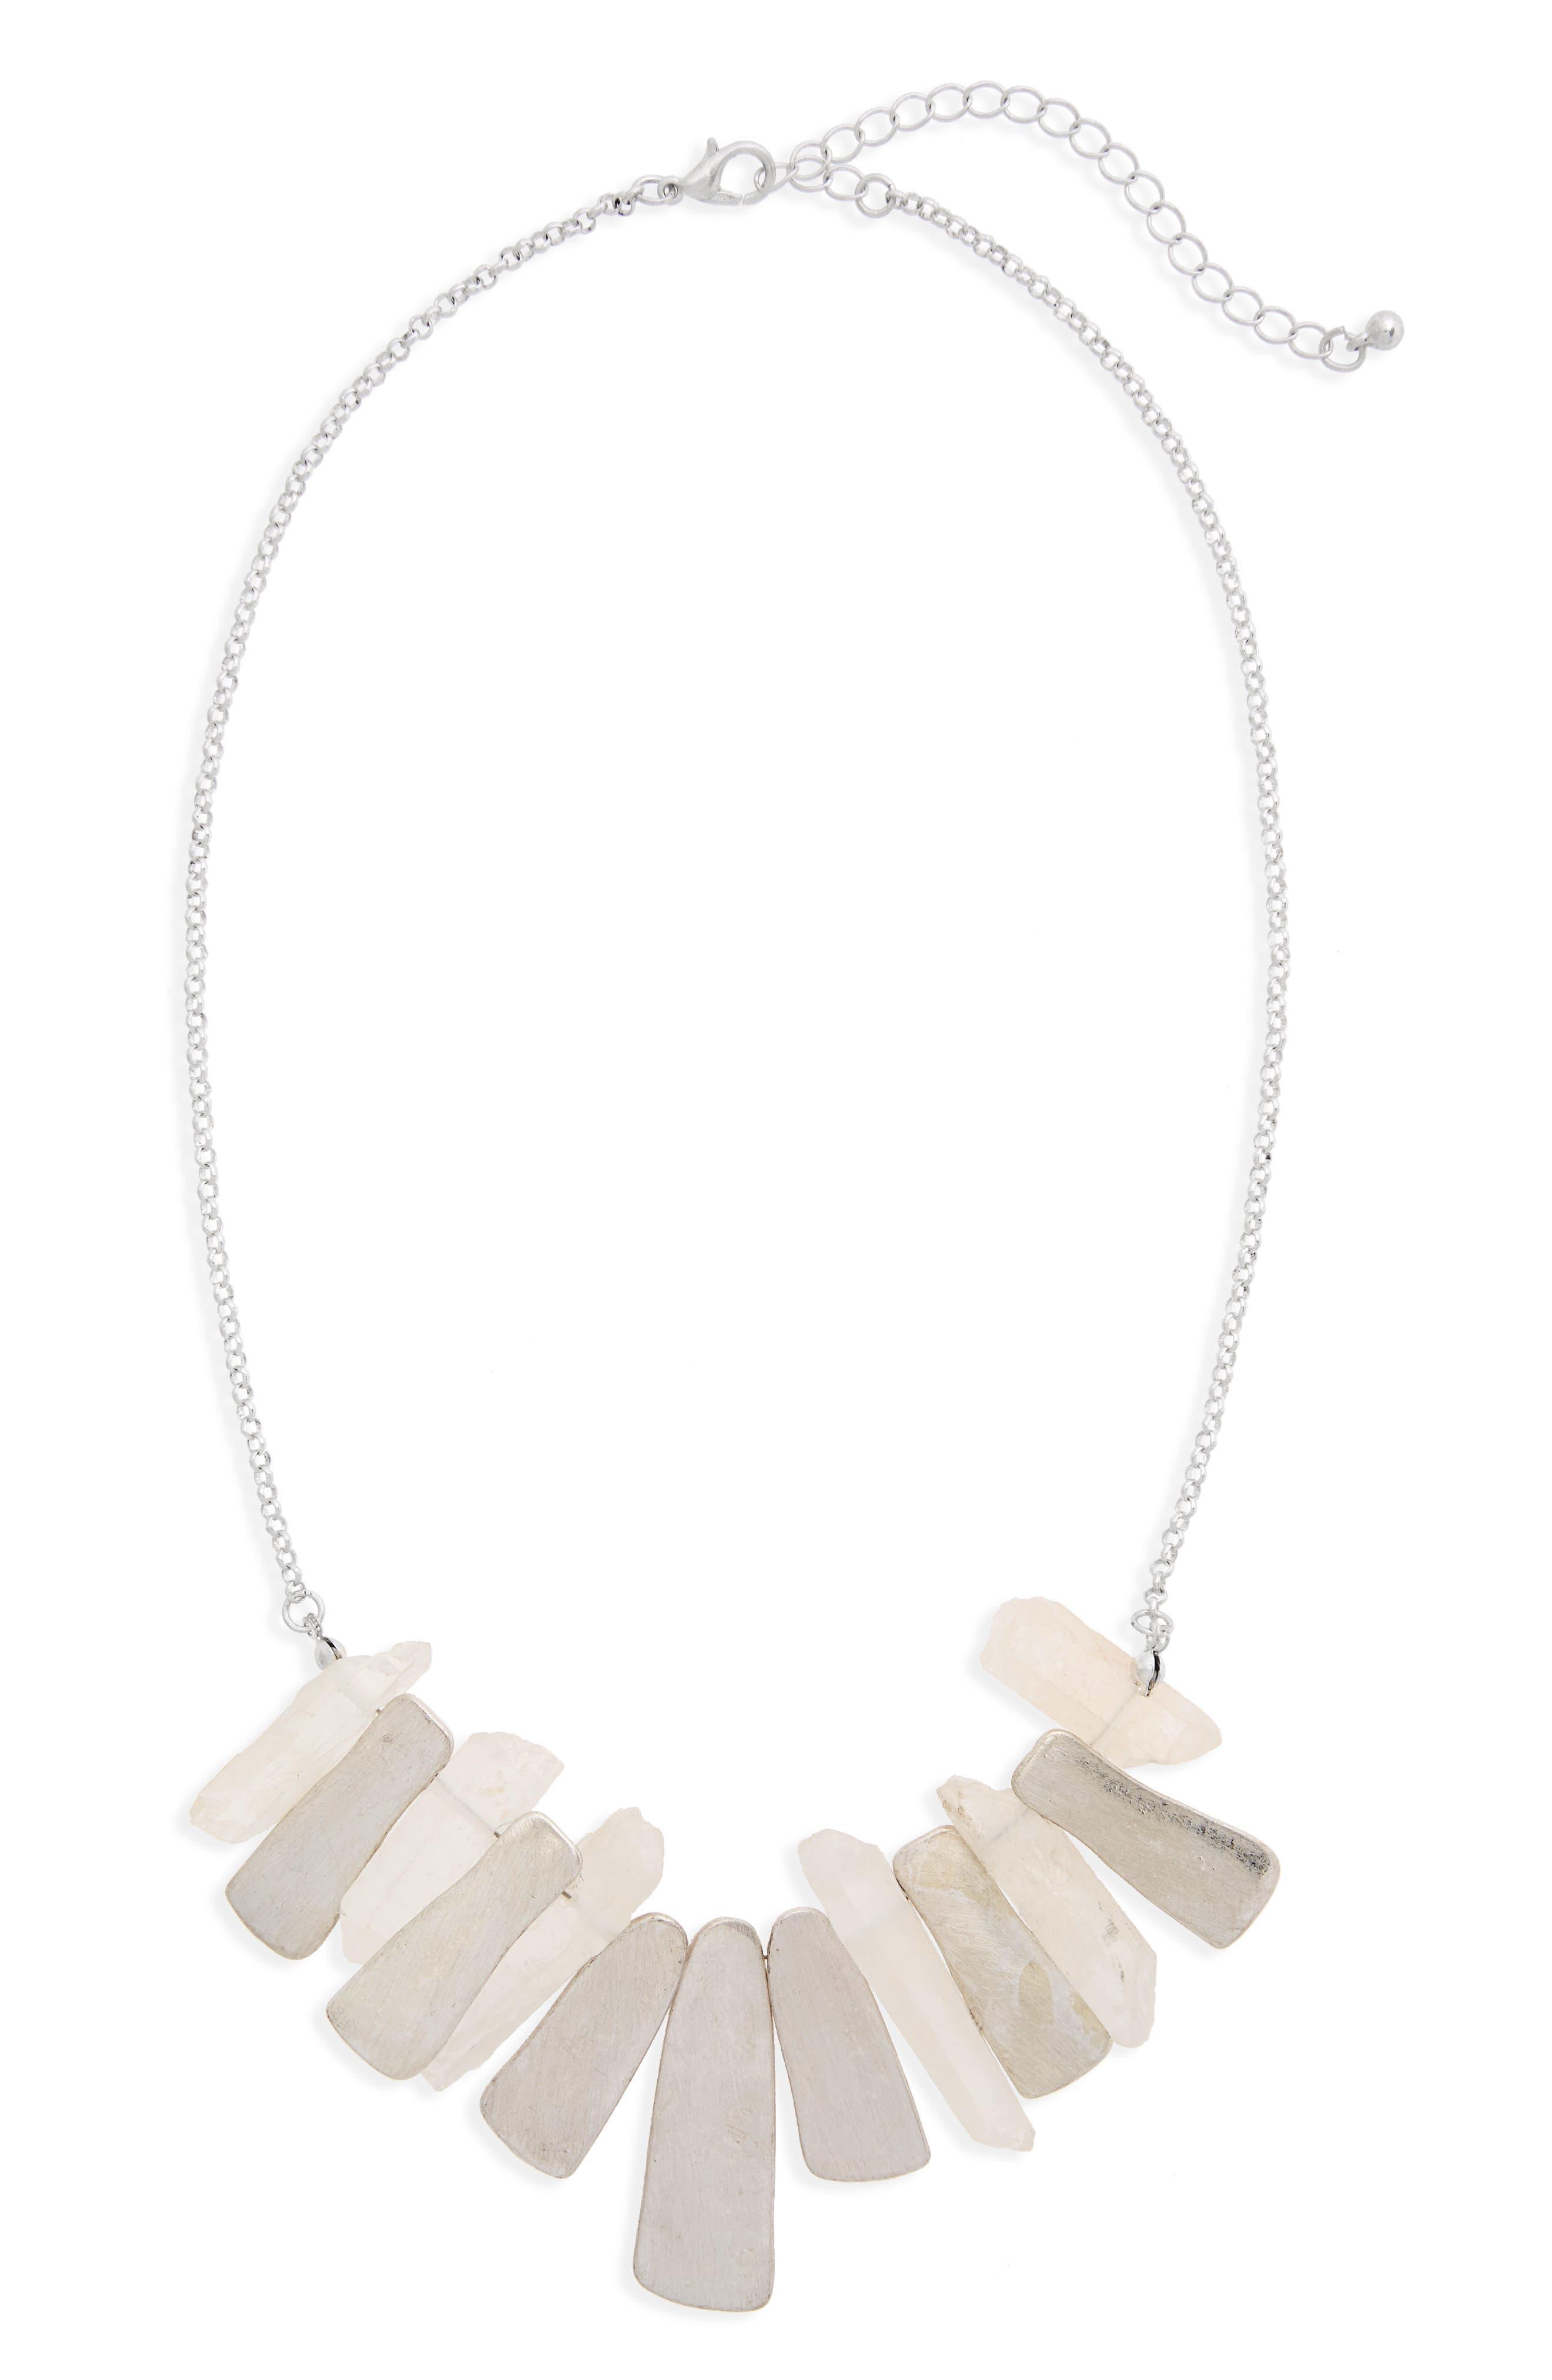 Pyrite Stone Necklace,                             Main thumbnail 1, color,                             040